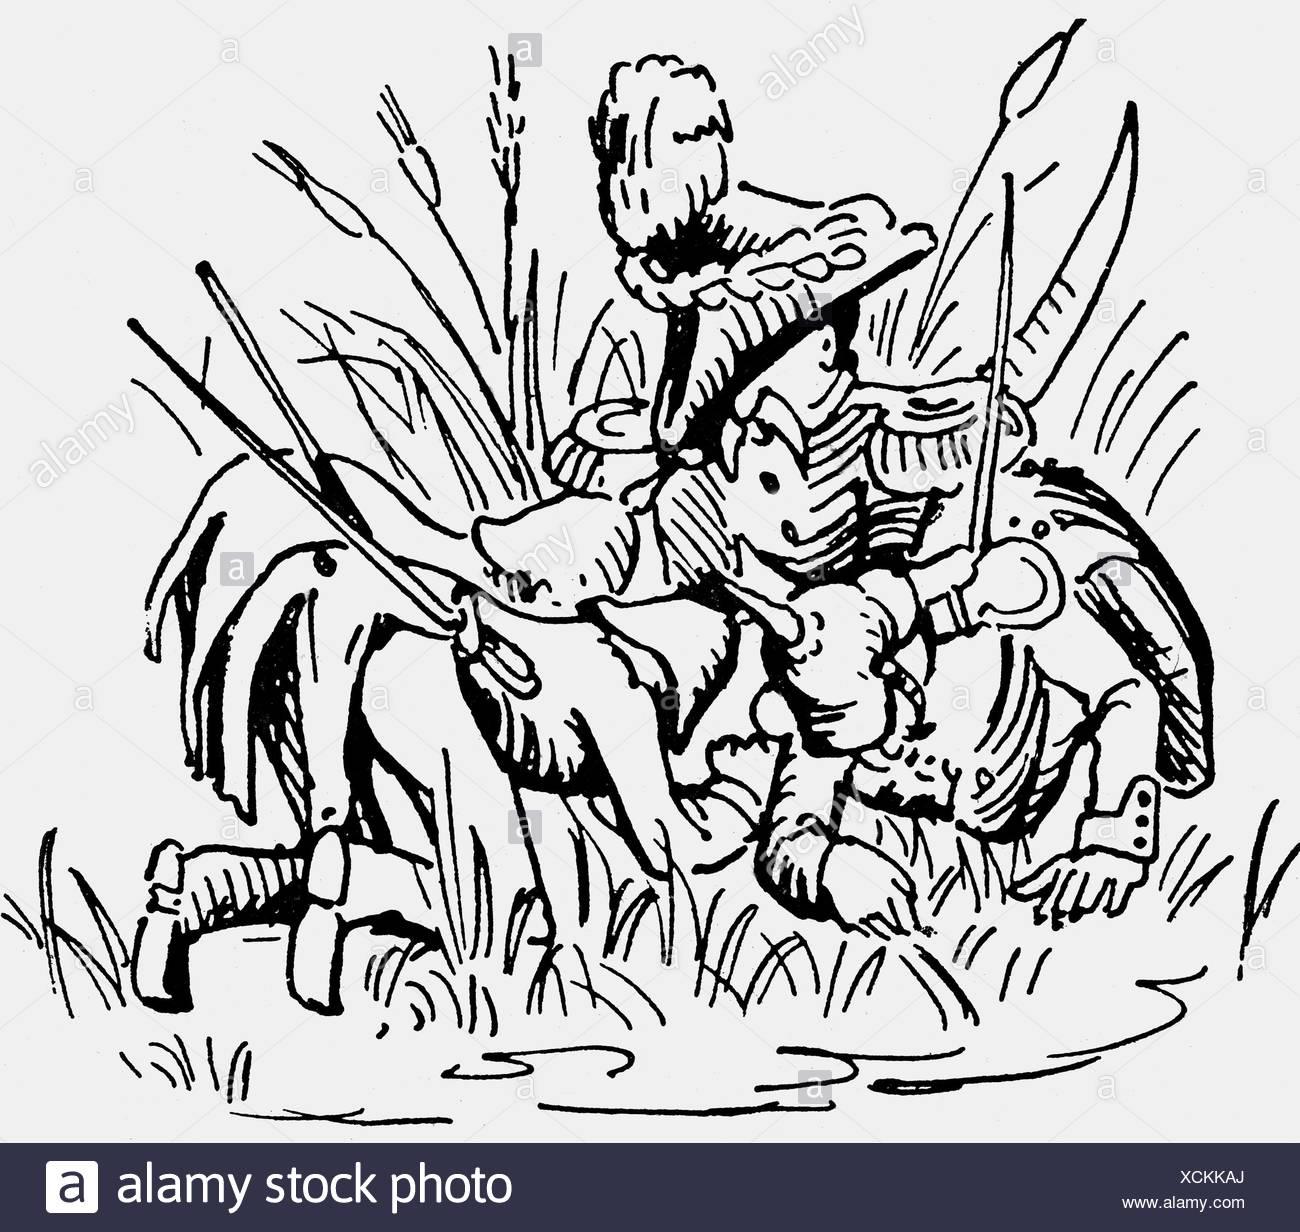 Wrangel, Friedrich Heinrich count of, 13.4.1784 - 1.11.1877, Prussian general, caricature, Wrangel harvesting grass', drawing, ' Stockbild